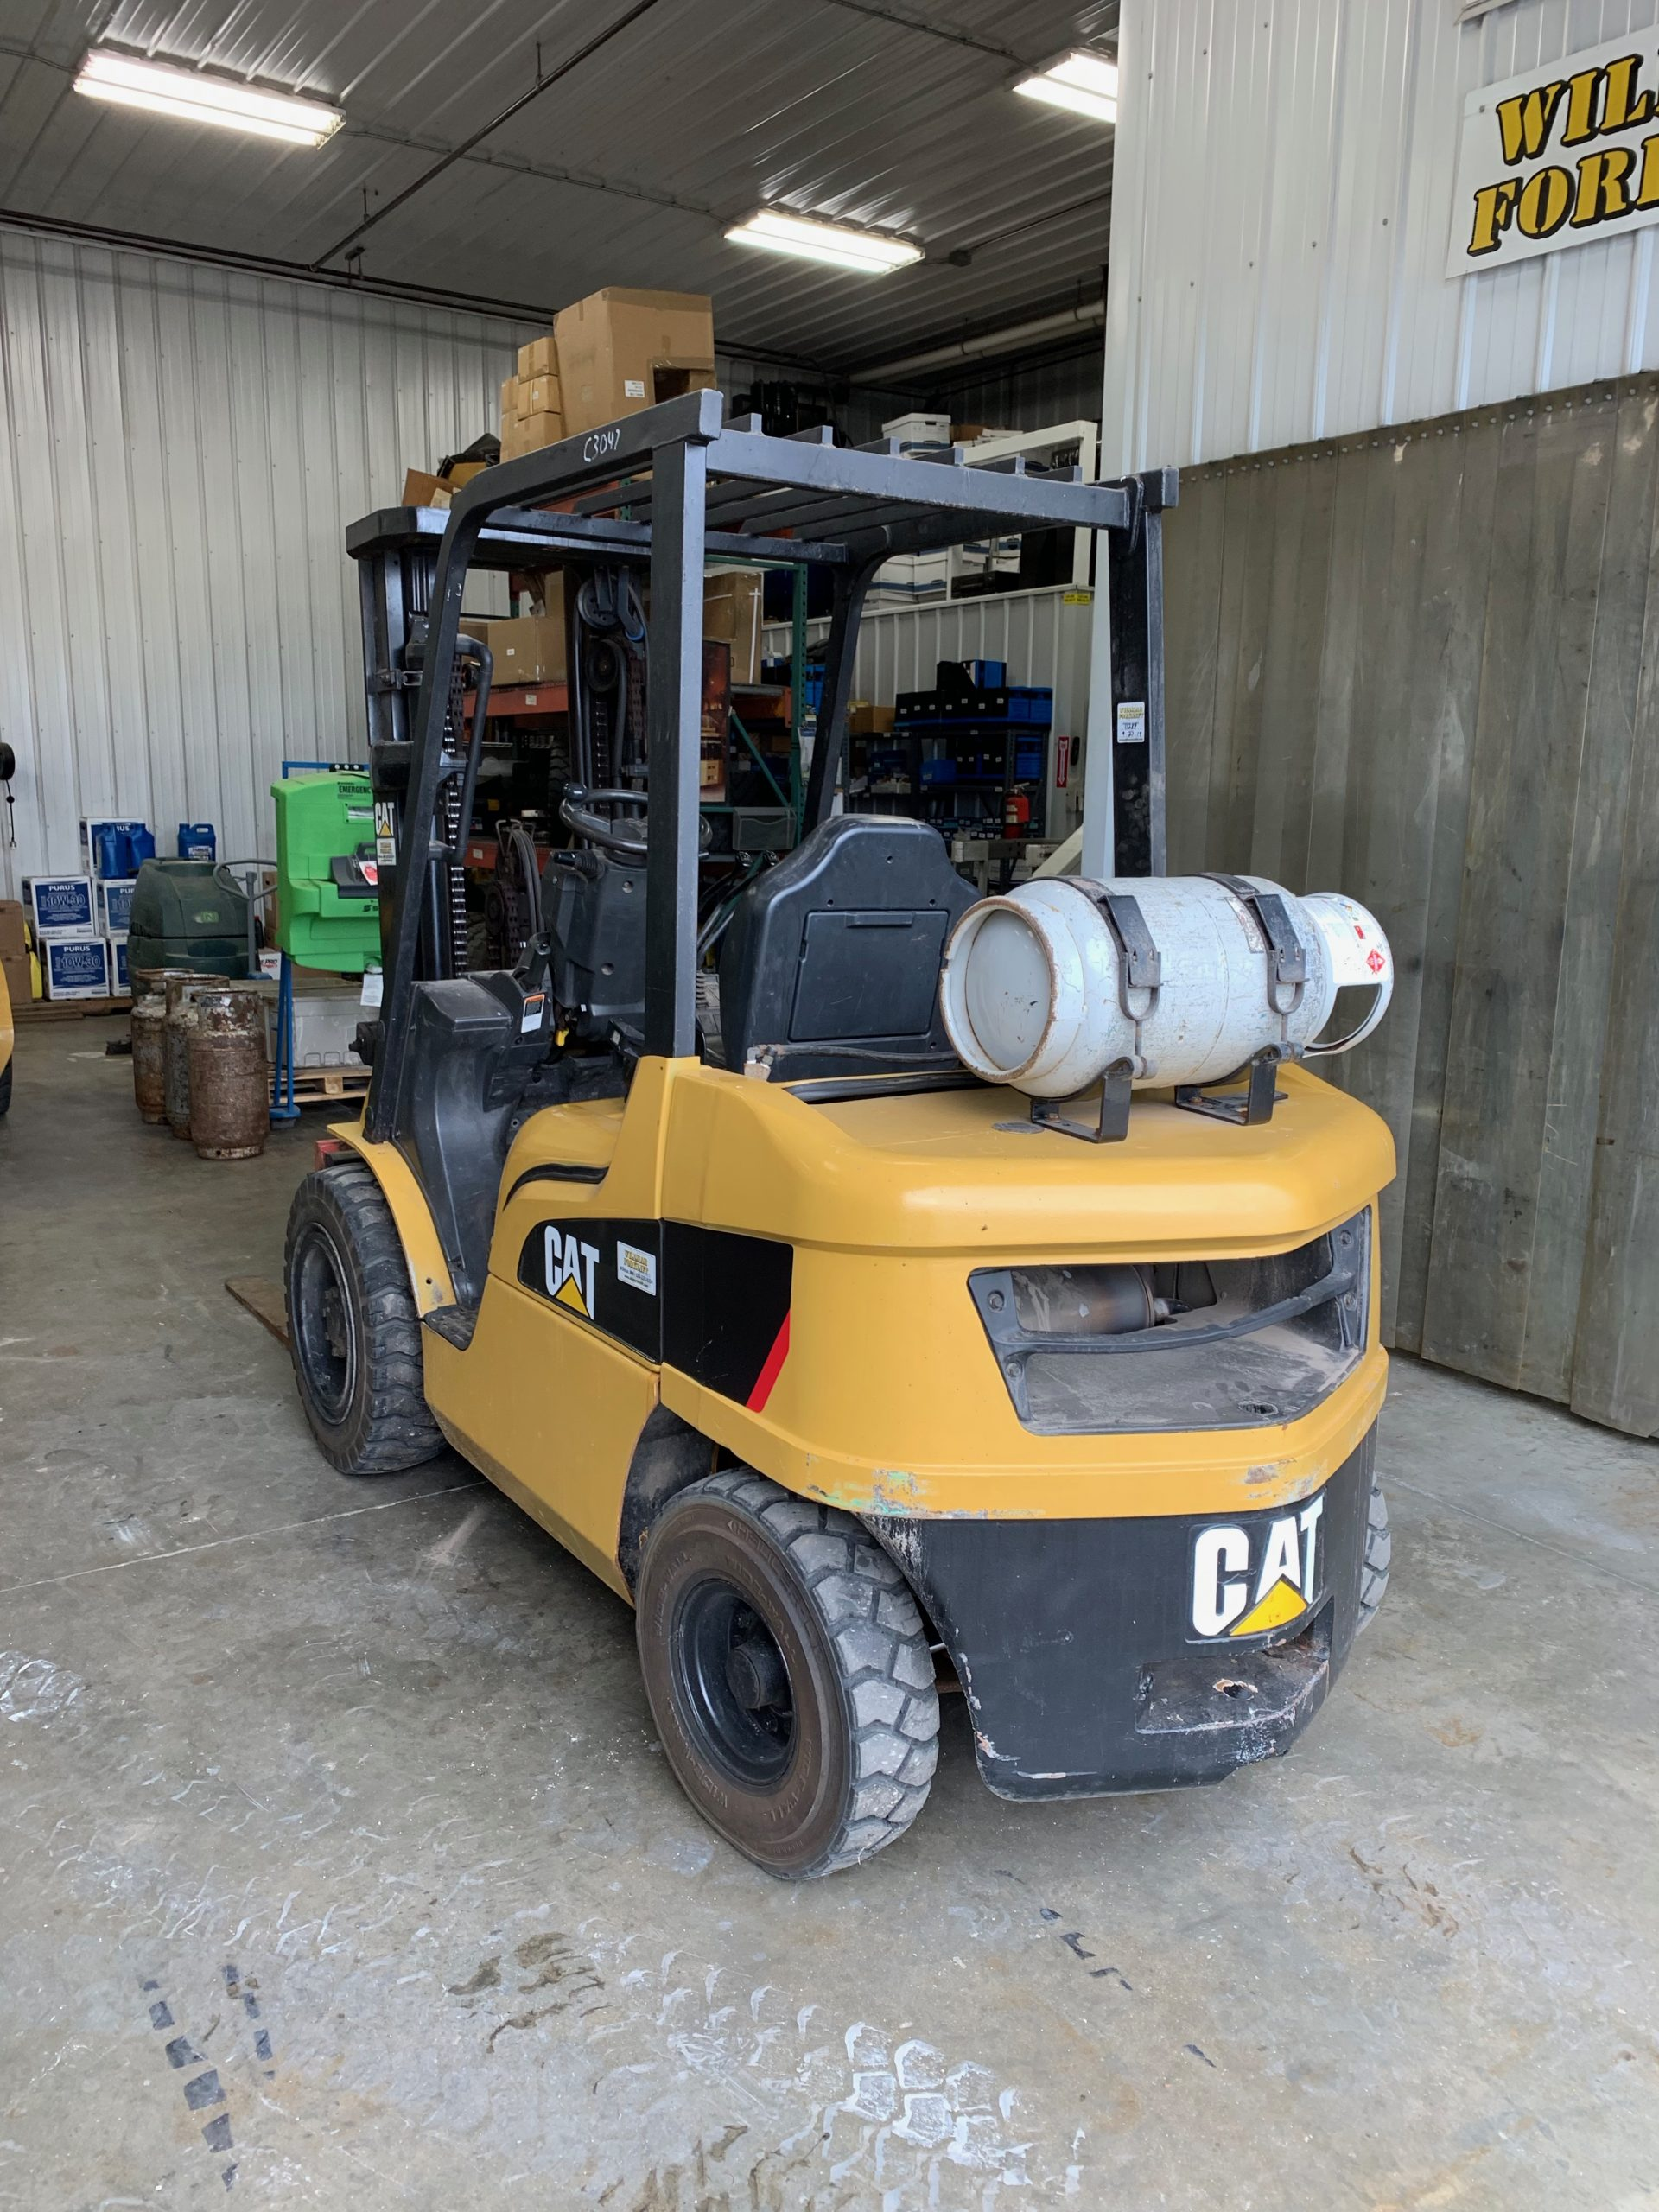 Caterpillar Forklift C3047